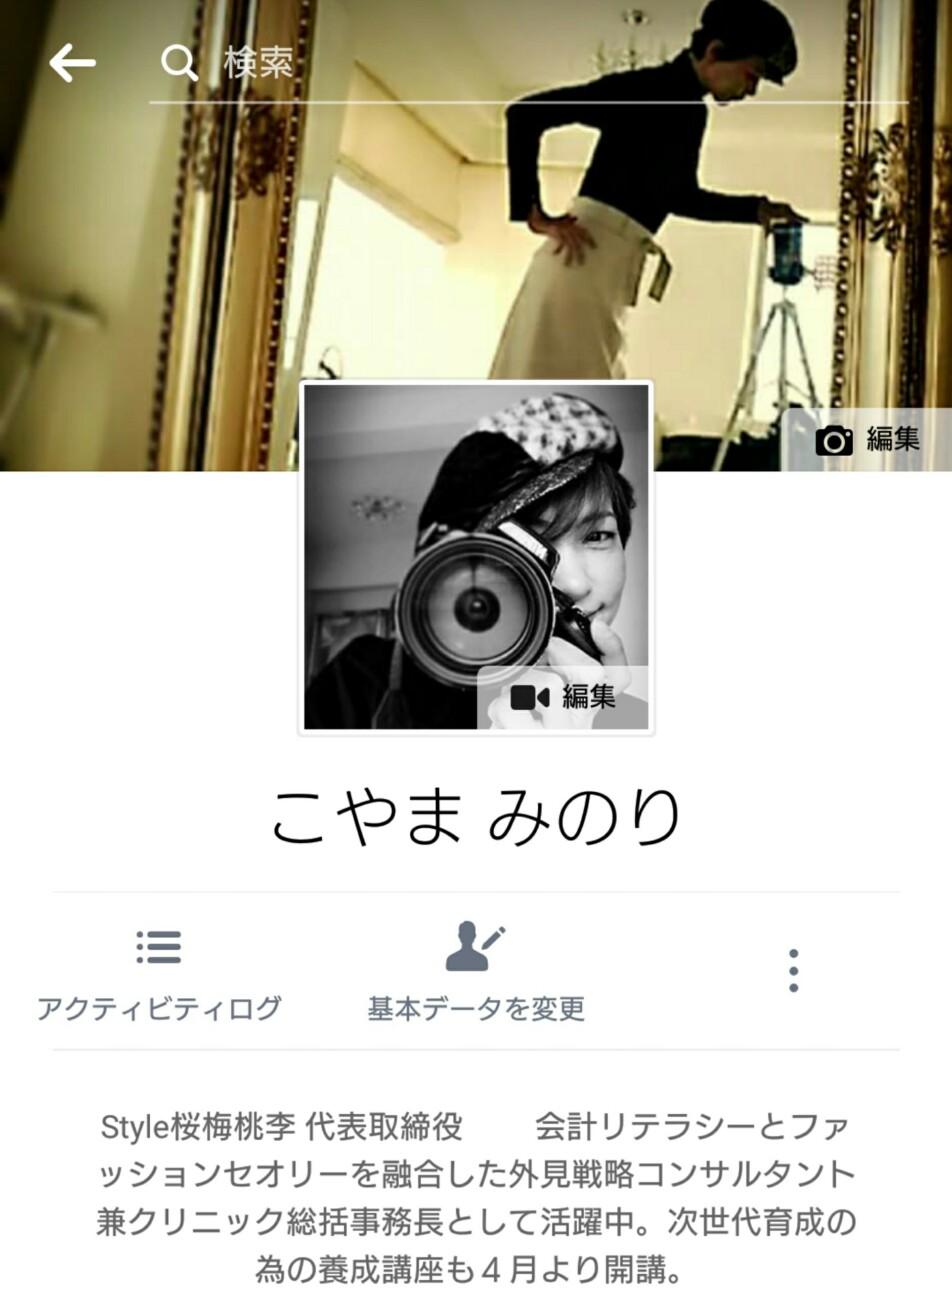 f:id:akira1007:20170304113733j:image